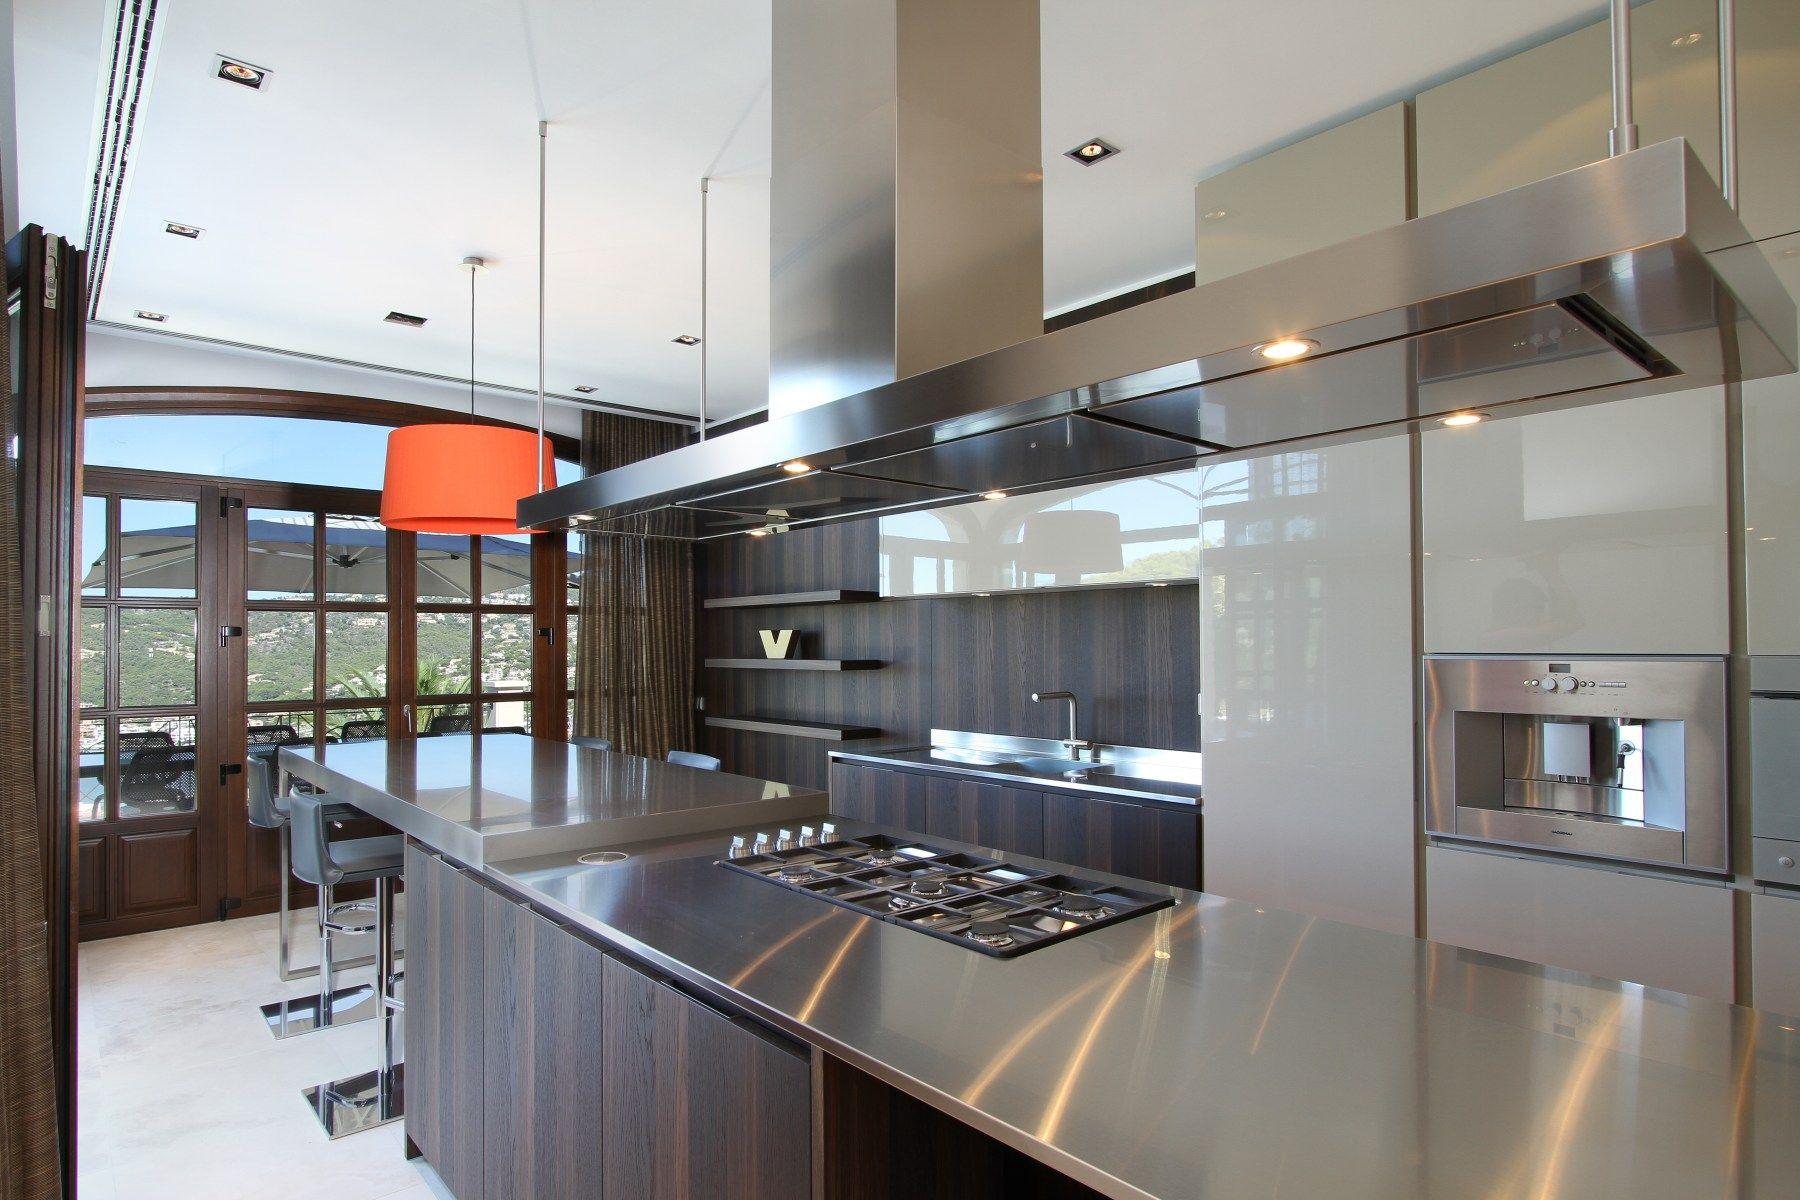 Luxury interiorcan suirell villa curve interior design